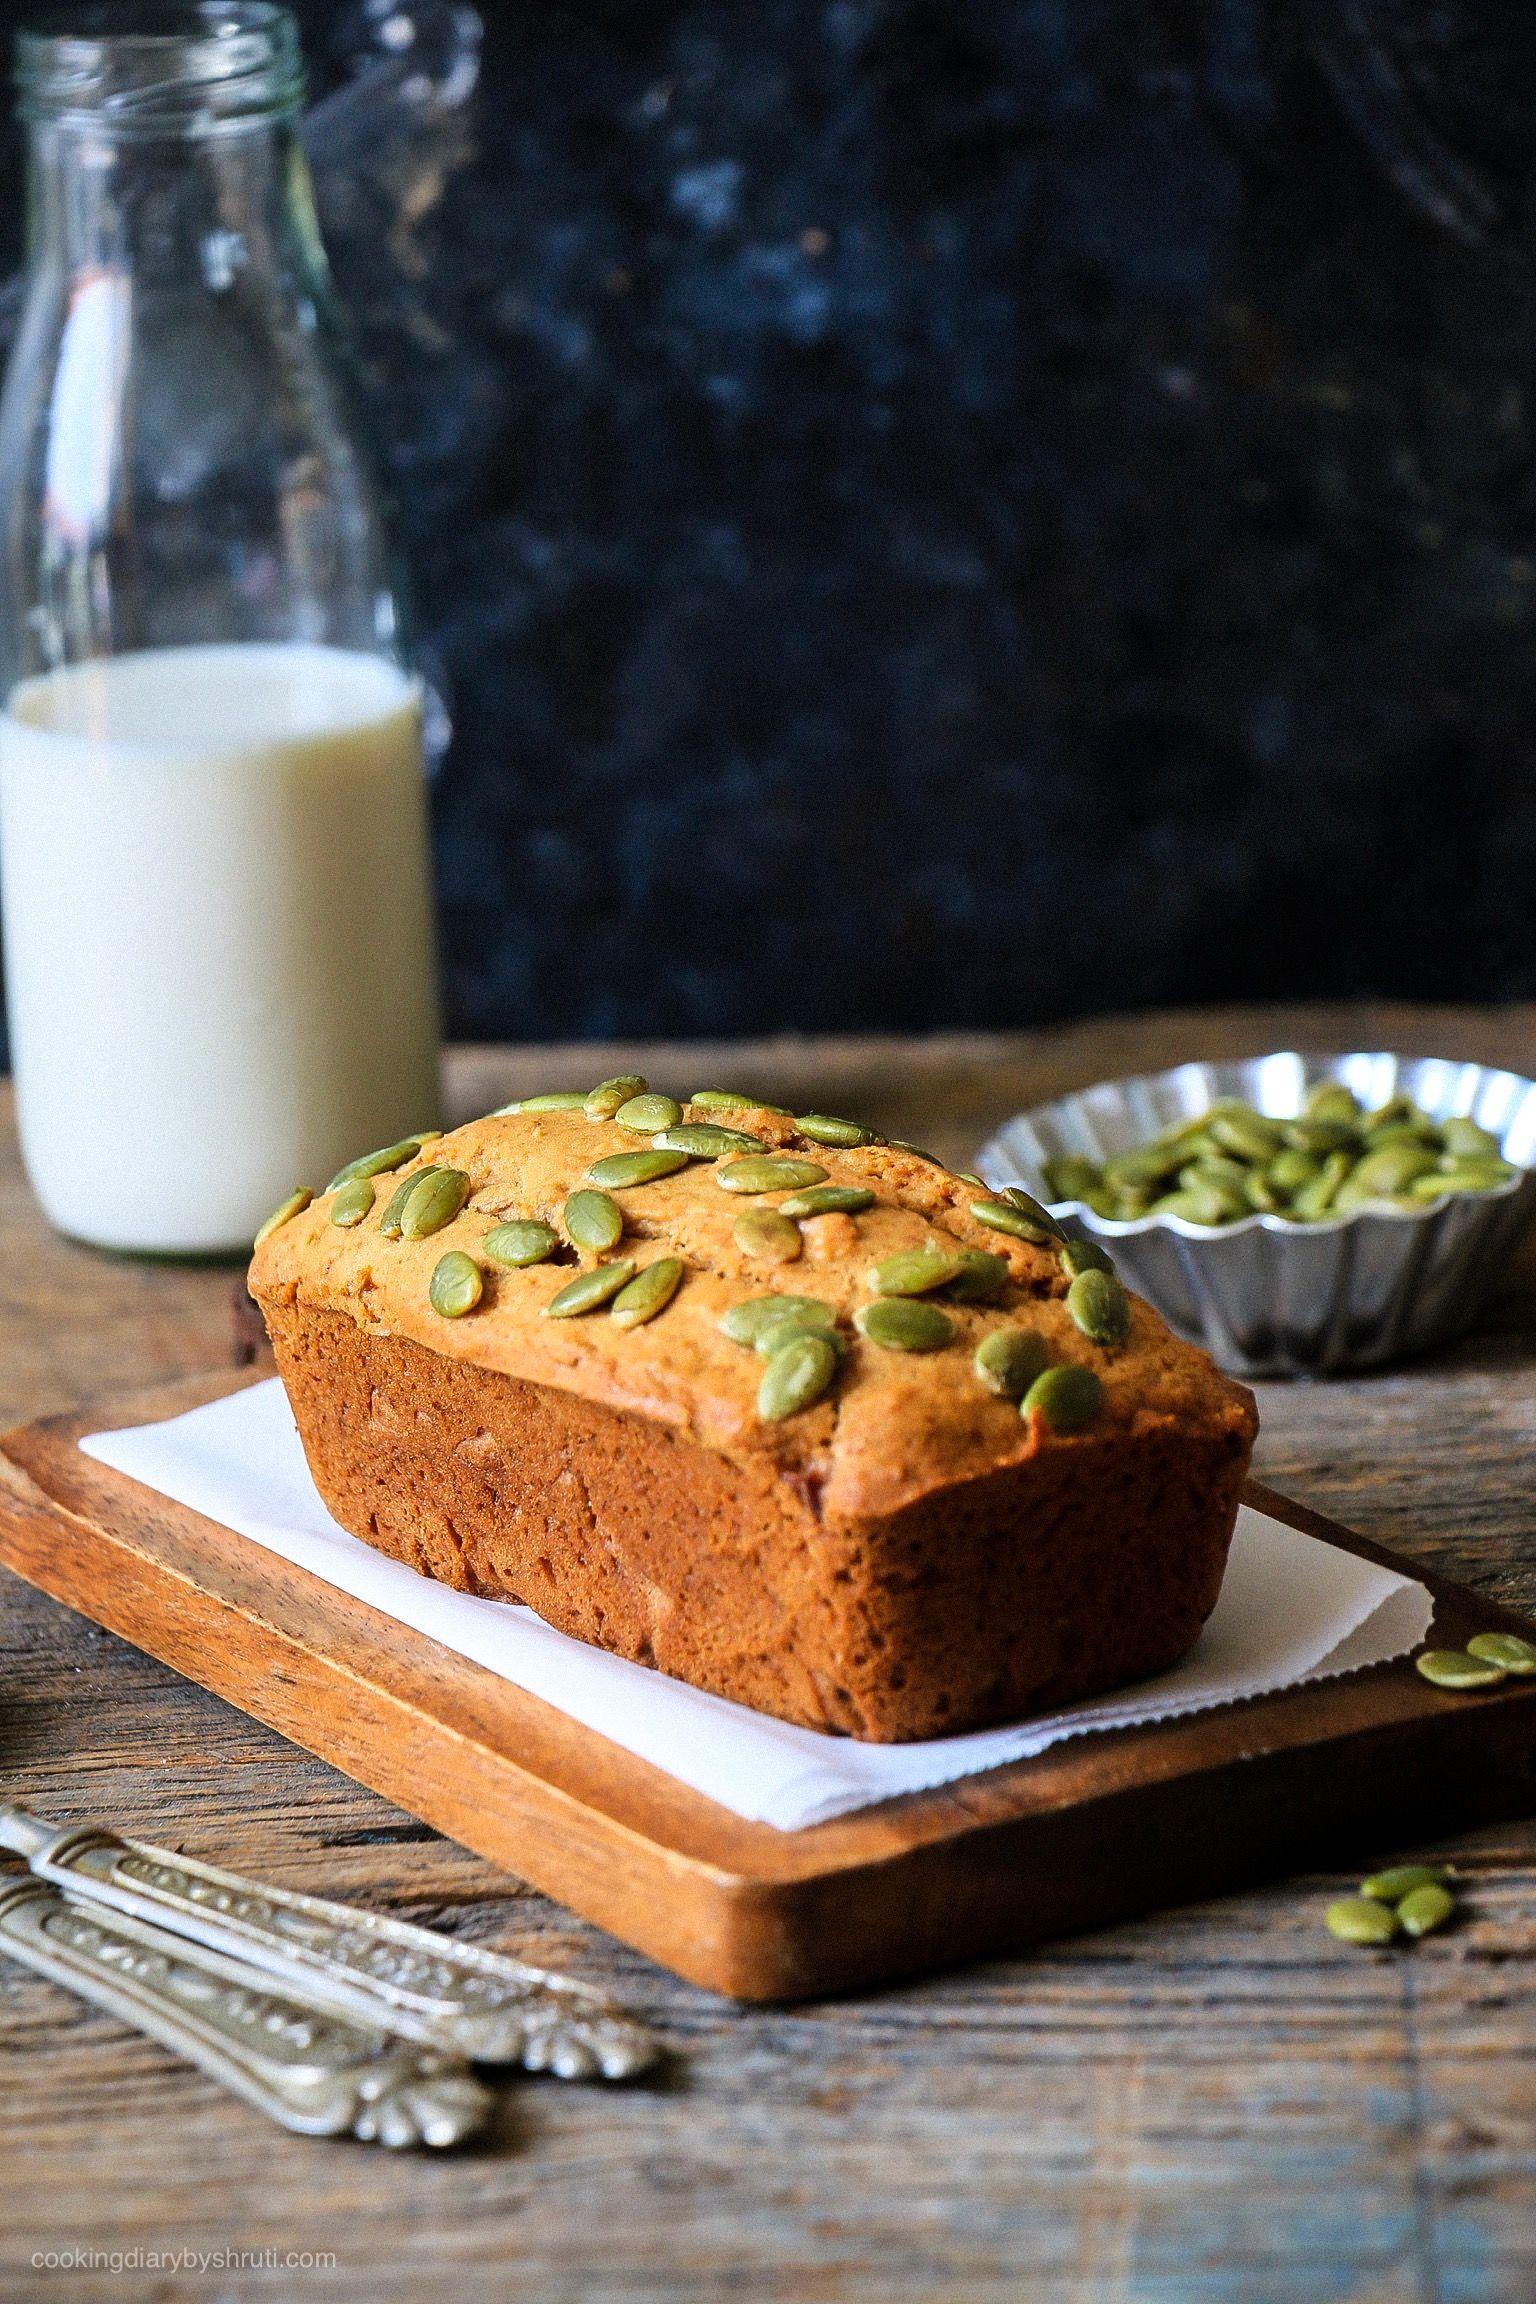 Oats & Pumpkin Seeds Banana Bread #pumpkinseedsrecipebaked